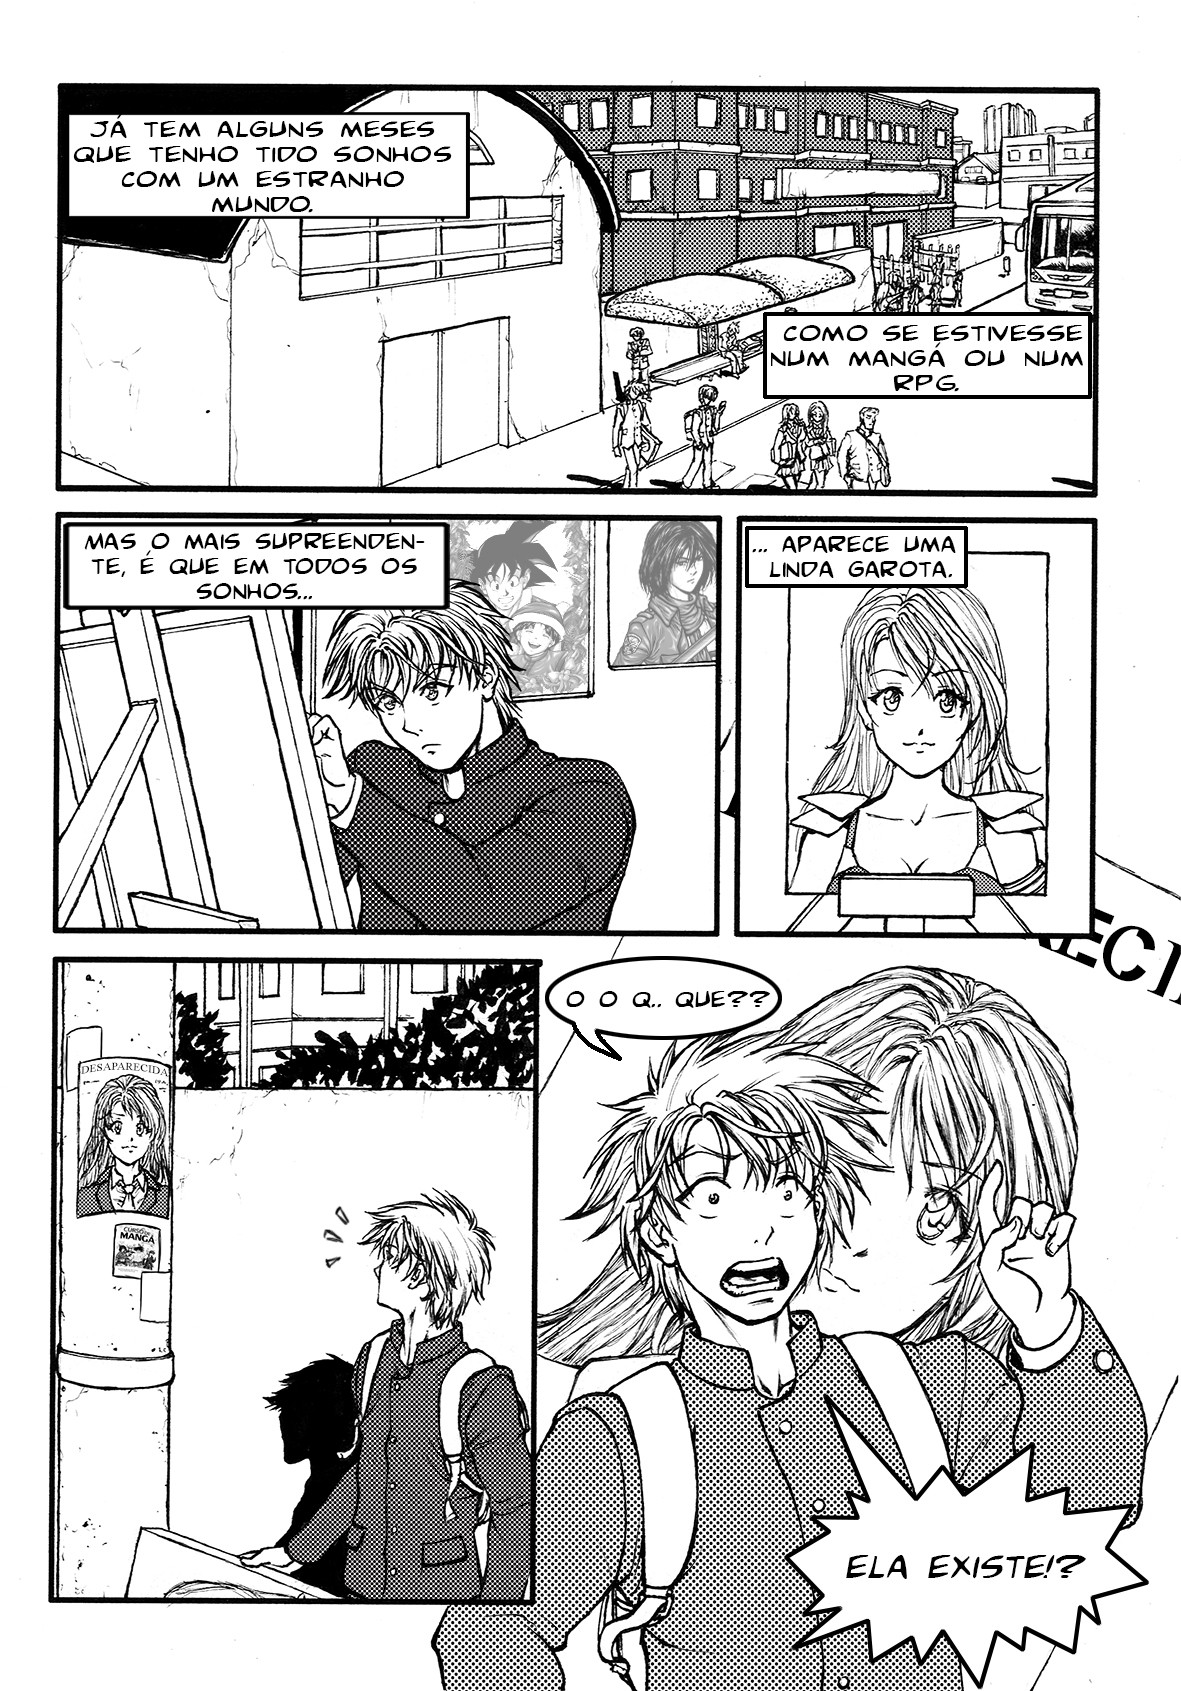 Gustavo melo pagina 02